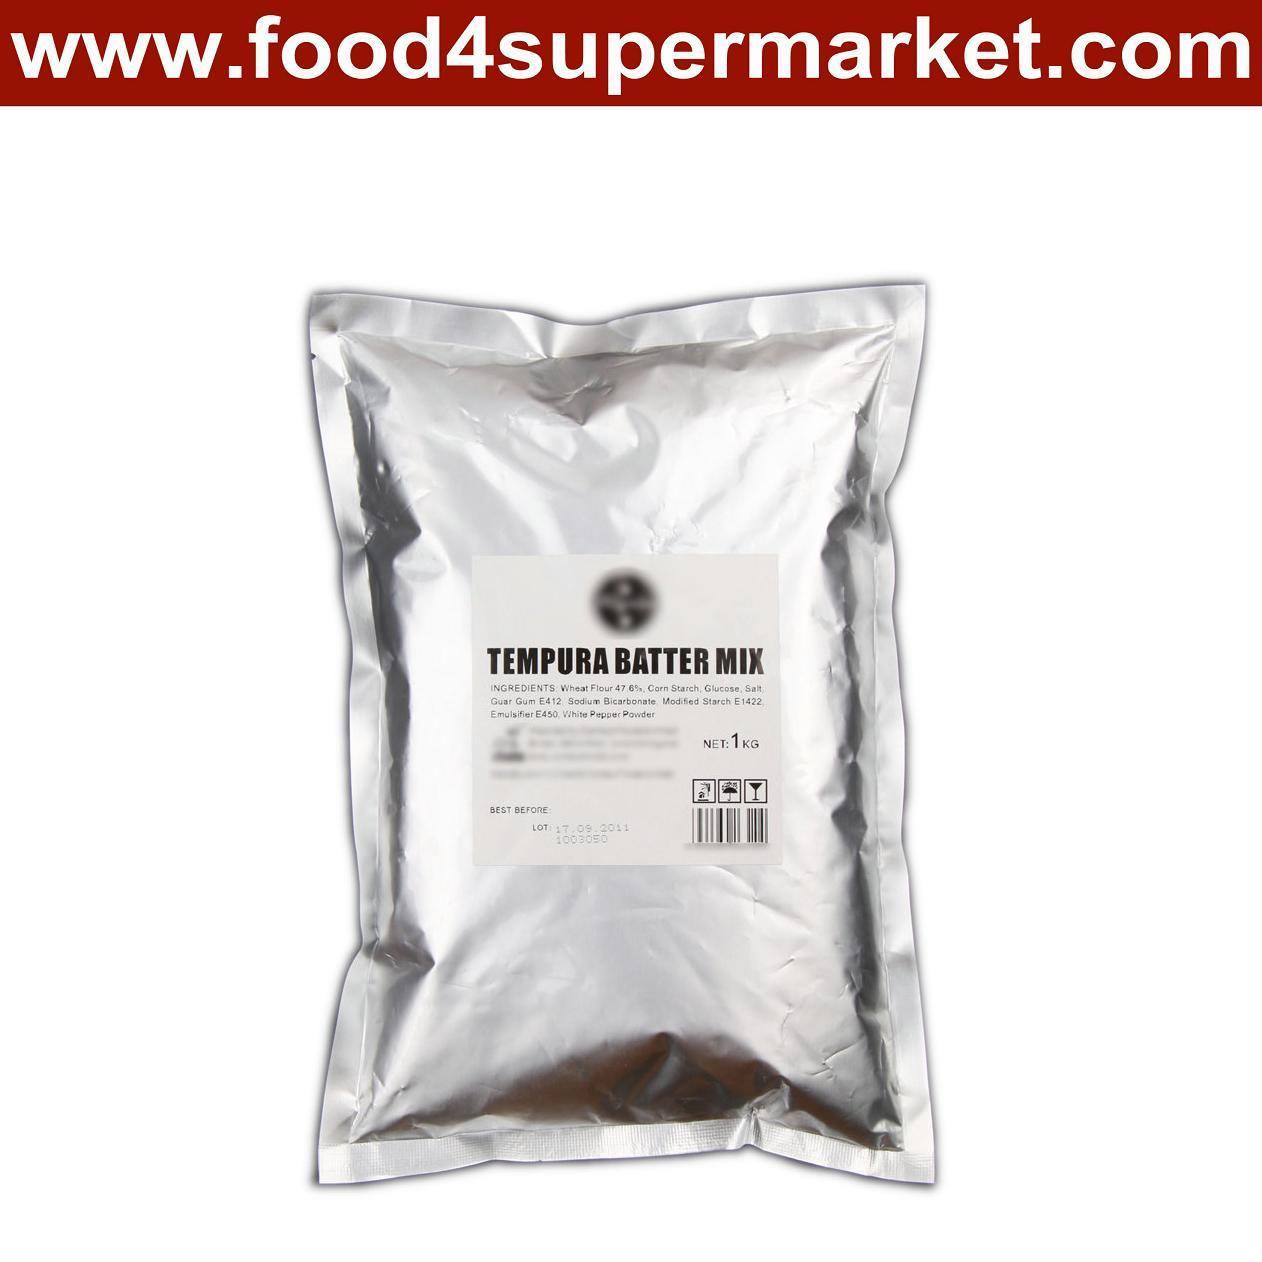 700g Tempura Flour